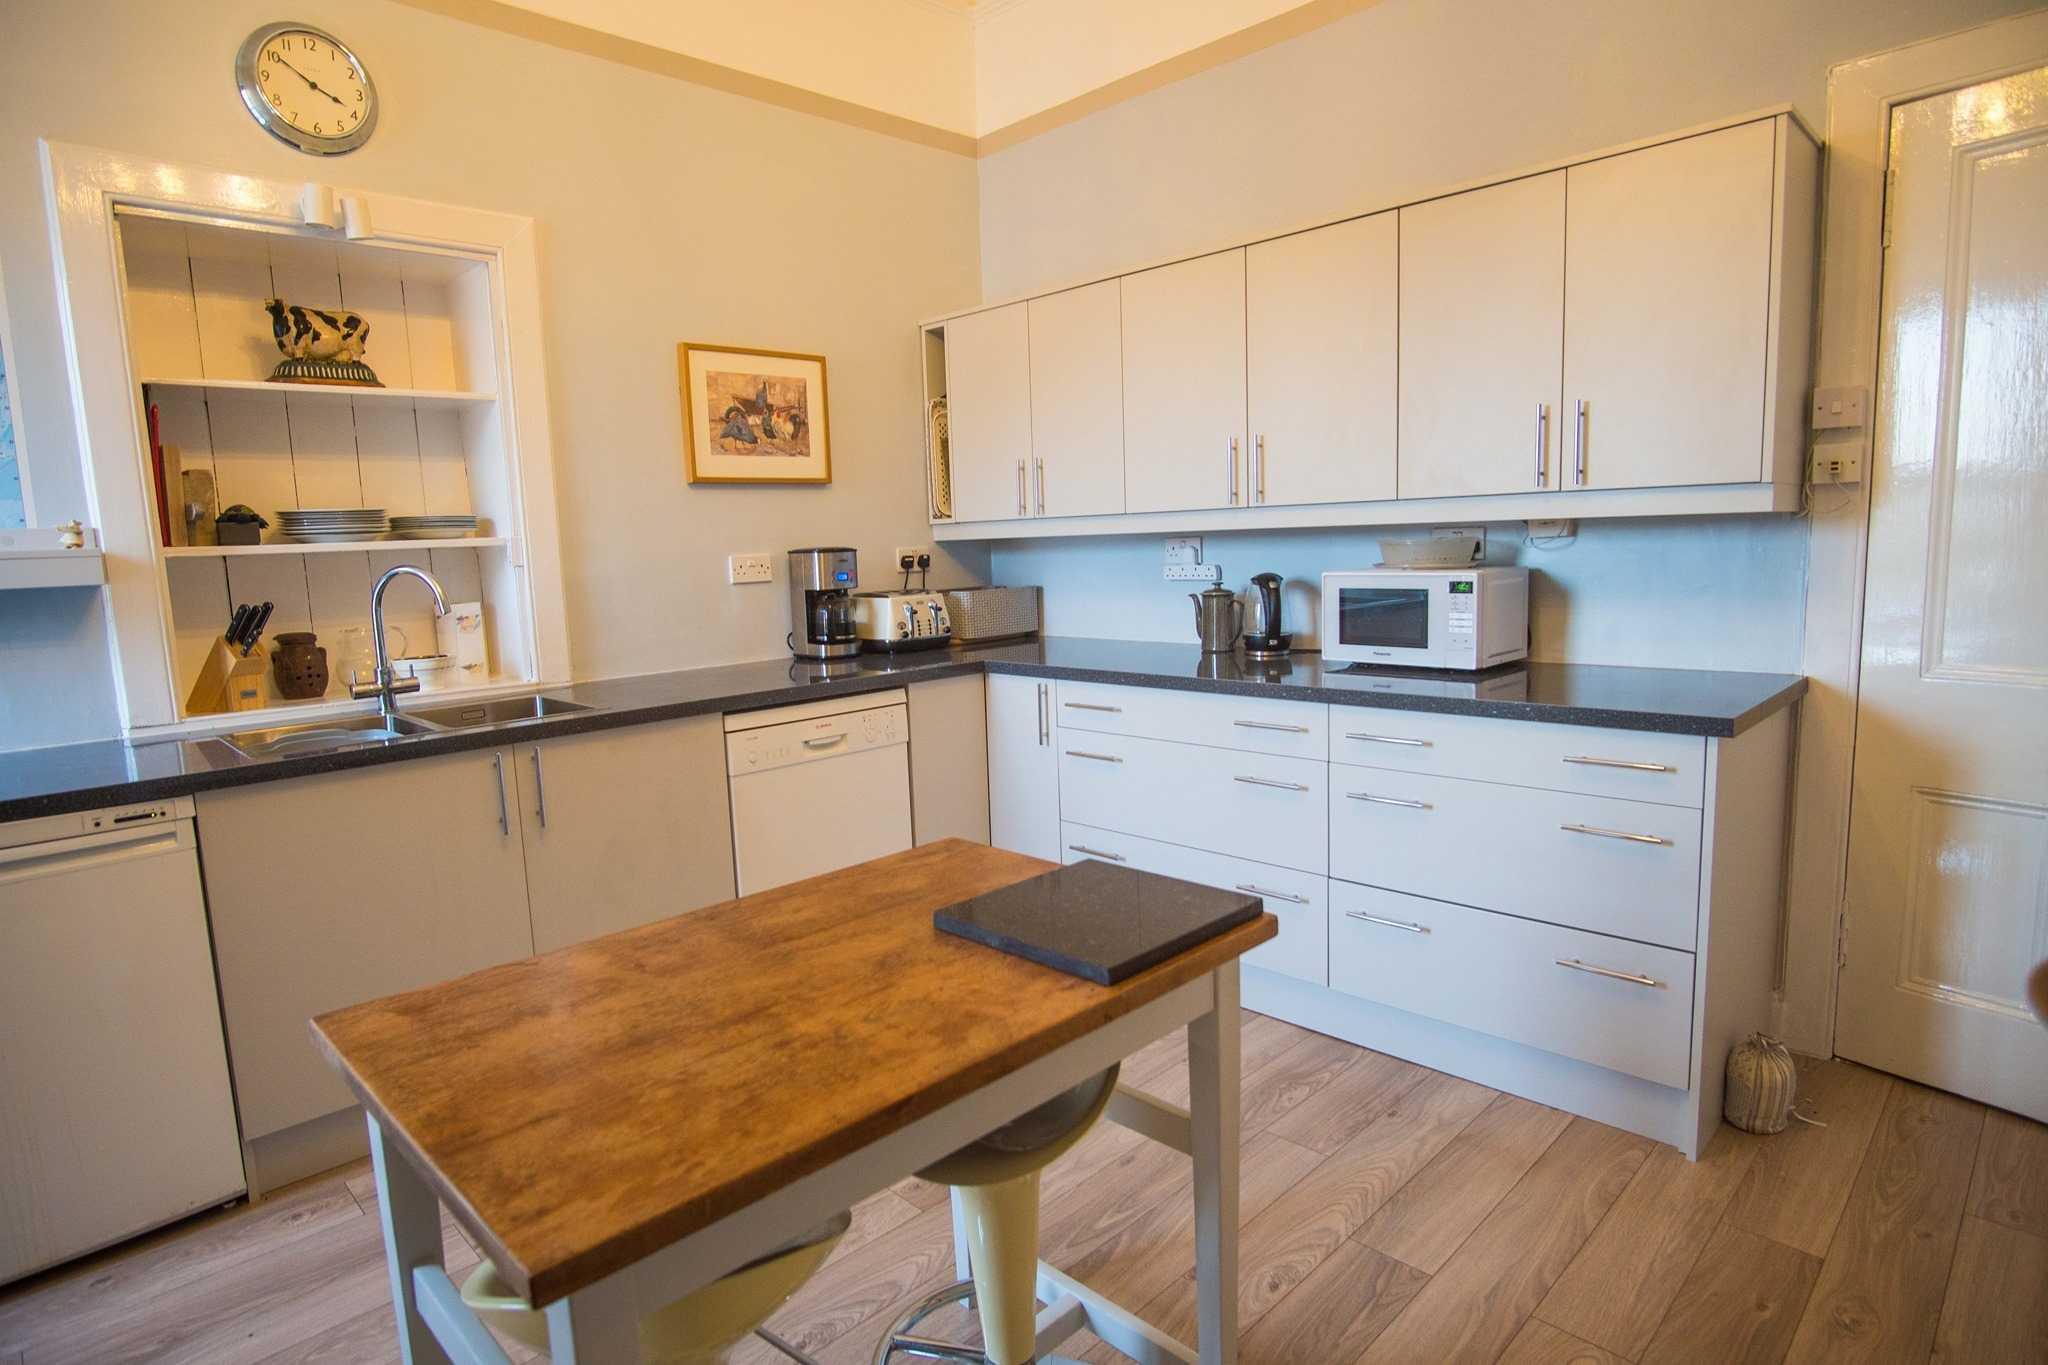 Newly installed kitchen bearsden